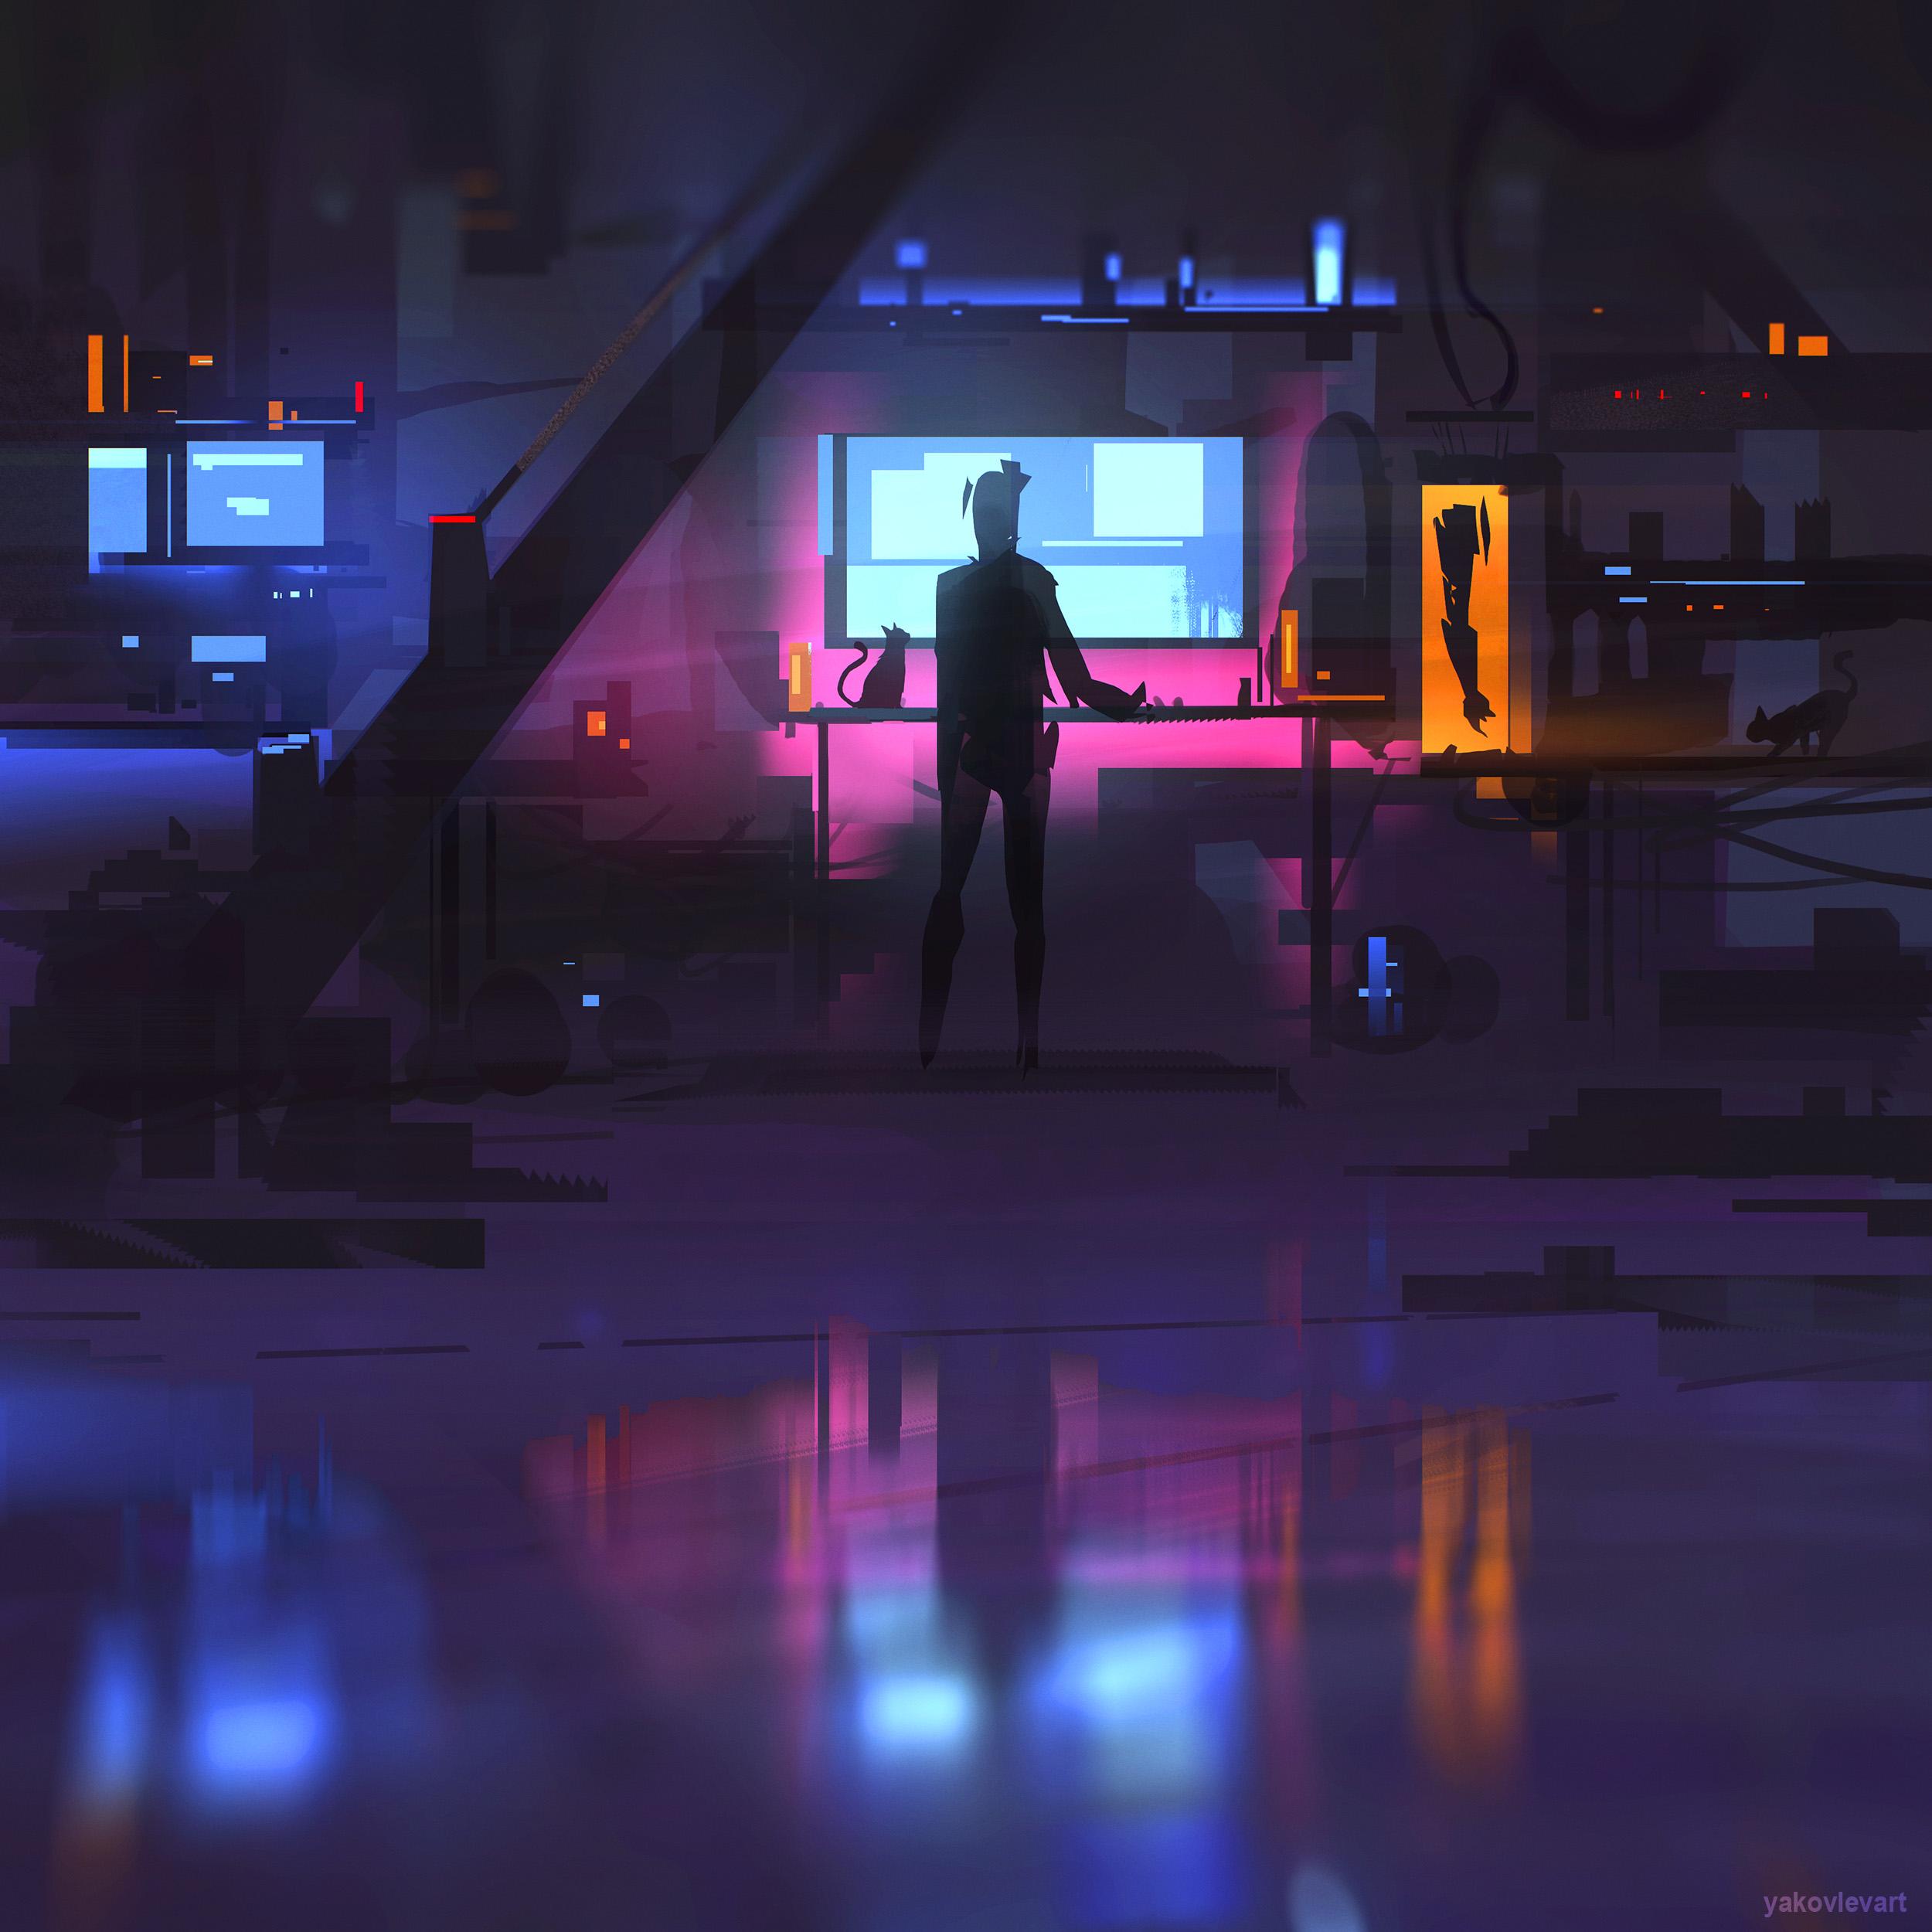 Anime Girl Wallpaper Hd Sci Fi Office By Yakovlevart On Newgrounds